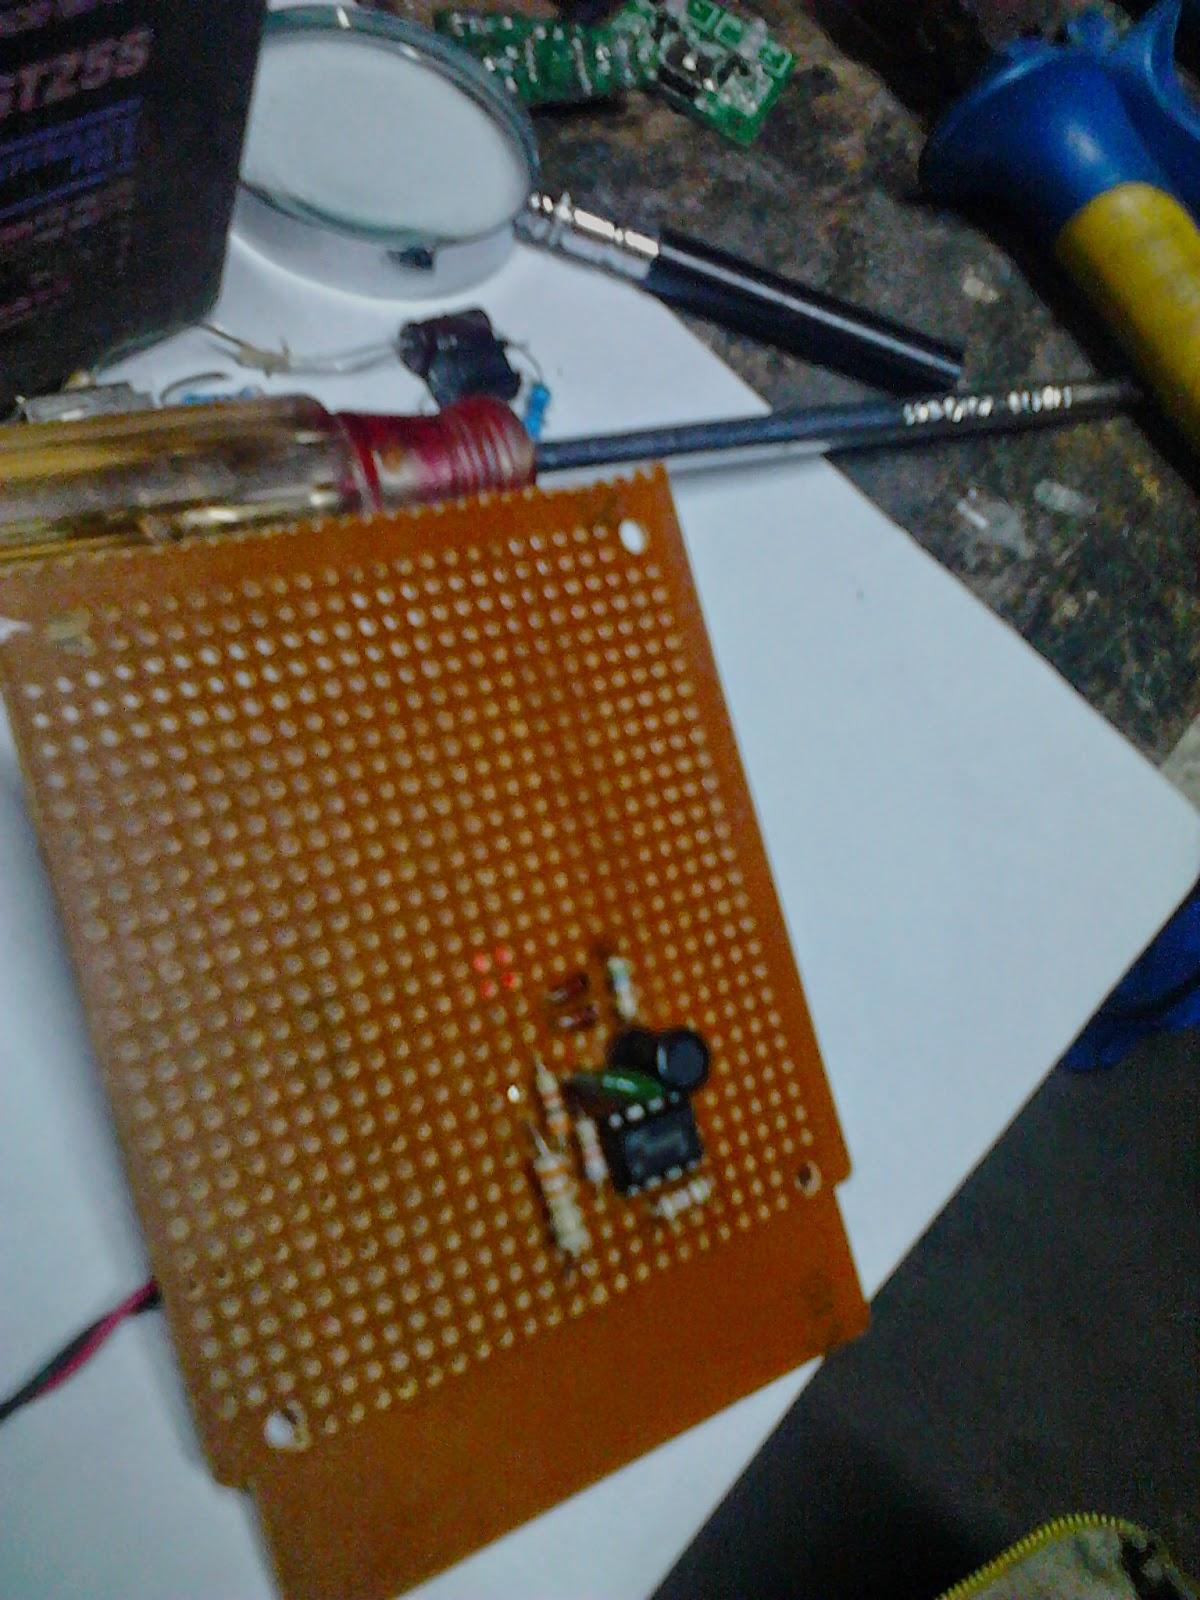 Foto Cerita Keji Pembantaian Pki Cahaya Suara Elektronika 22155 W Stereo Power Amplifier Circuit Based On Ba5417 Cara Membuat Powerbank